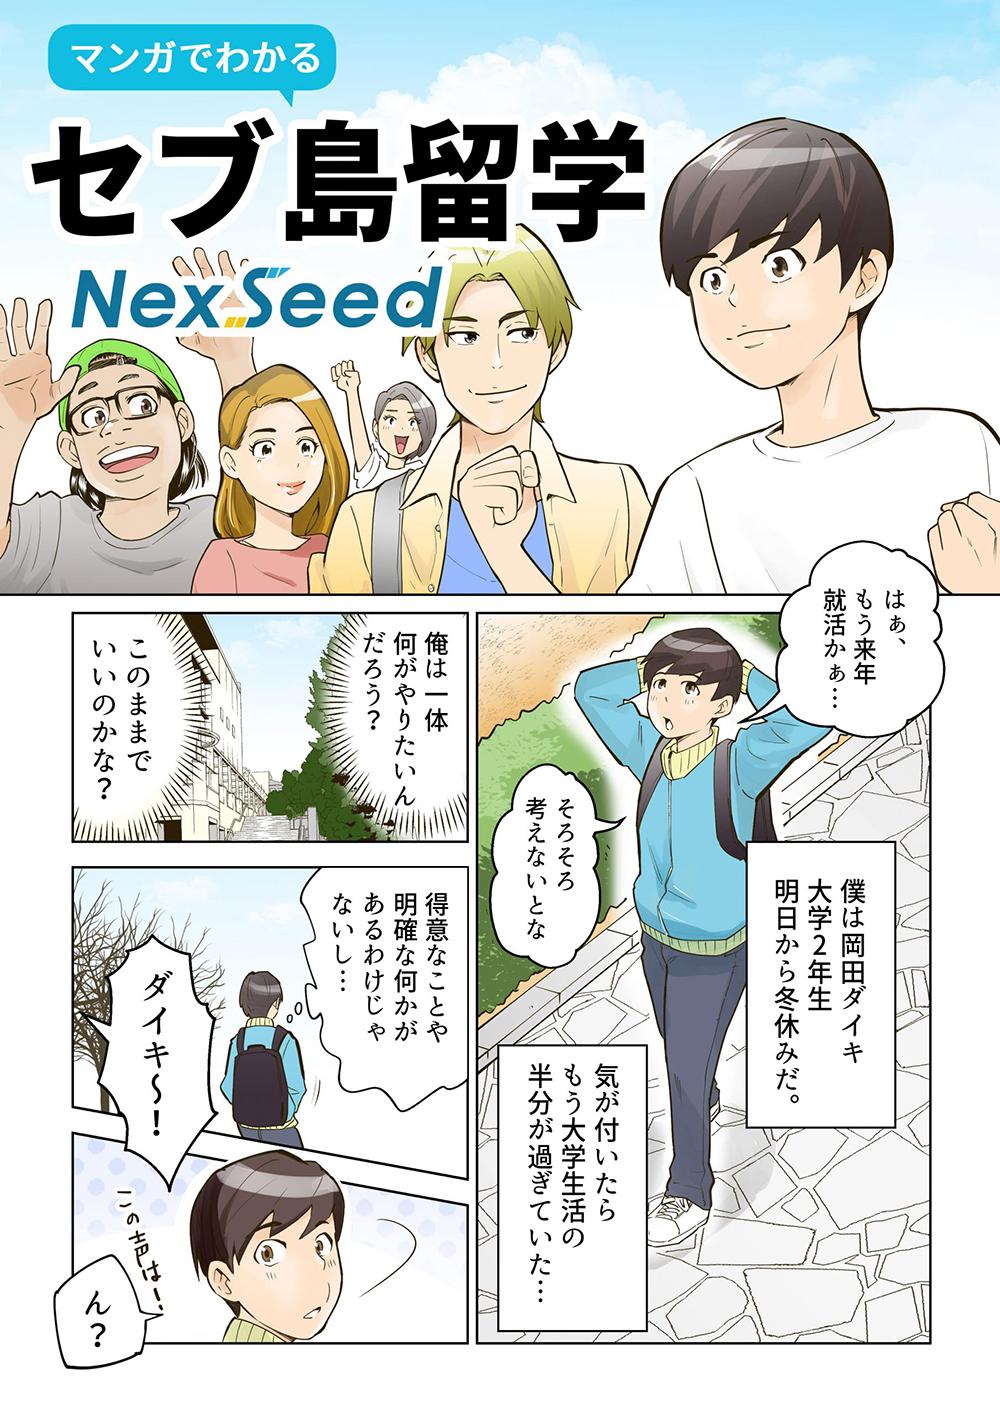 NexSeed (Seed Tech School)英語留学-01